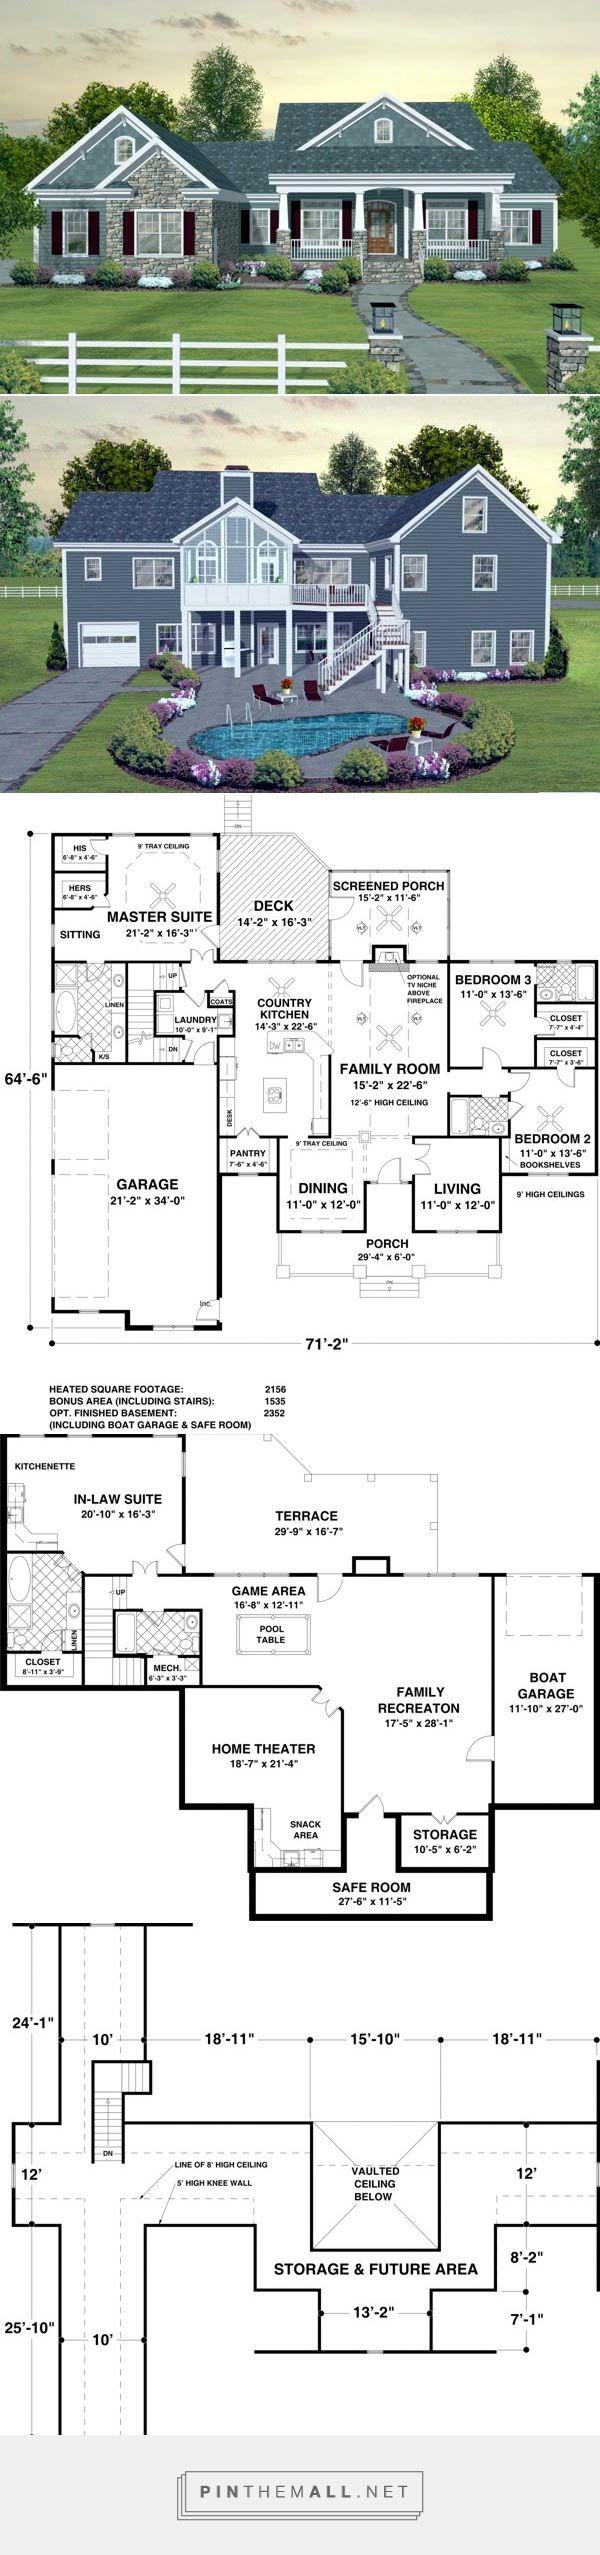 House Plan chp-45369 at COOLhouseplans.com –